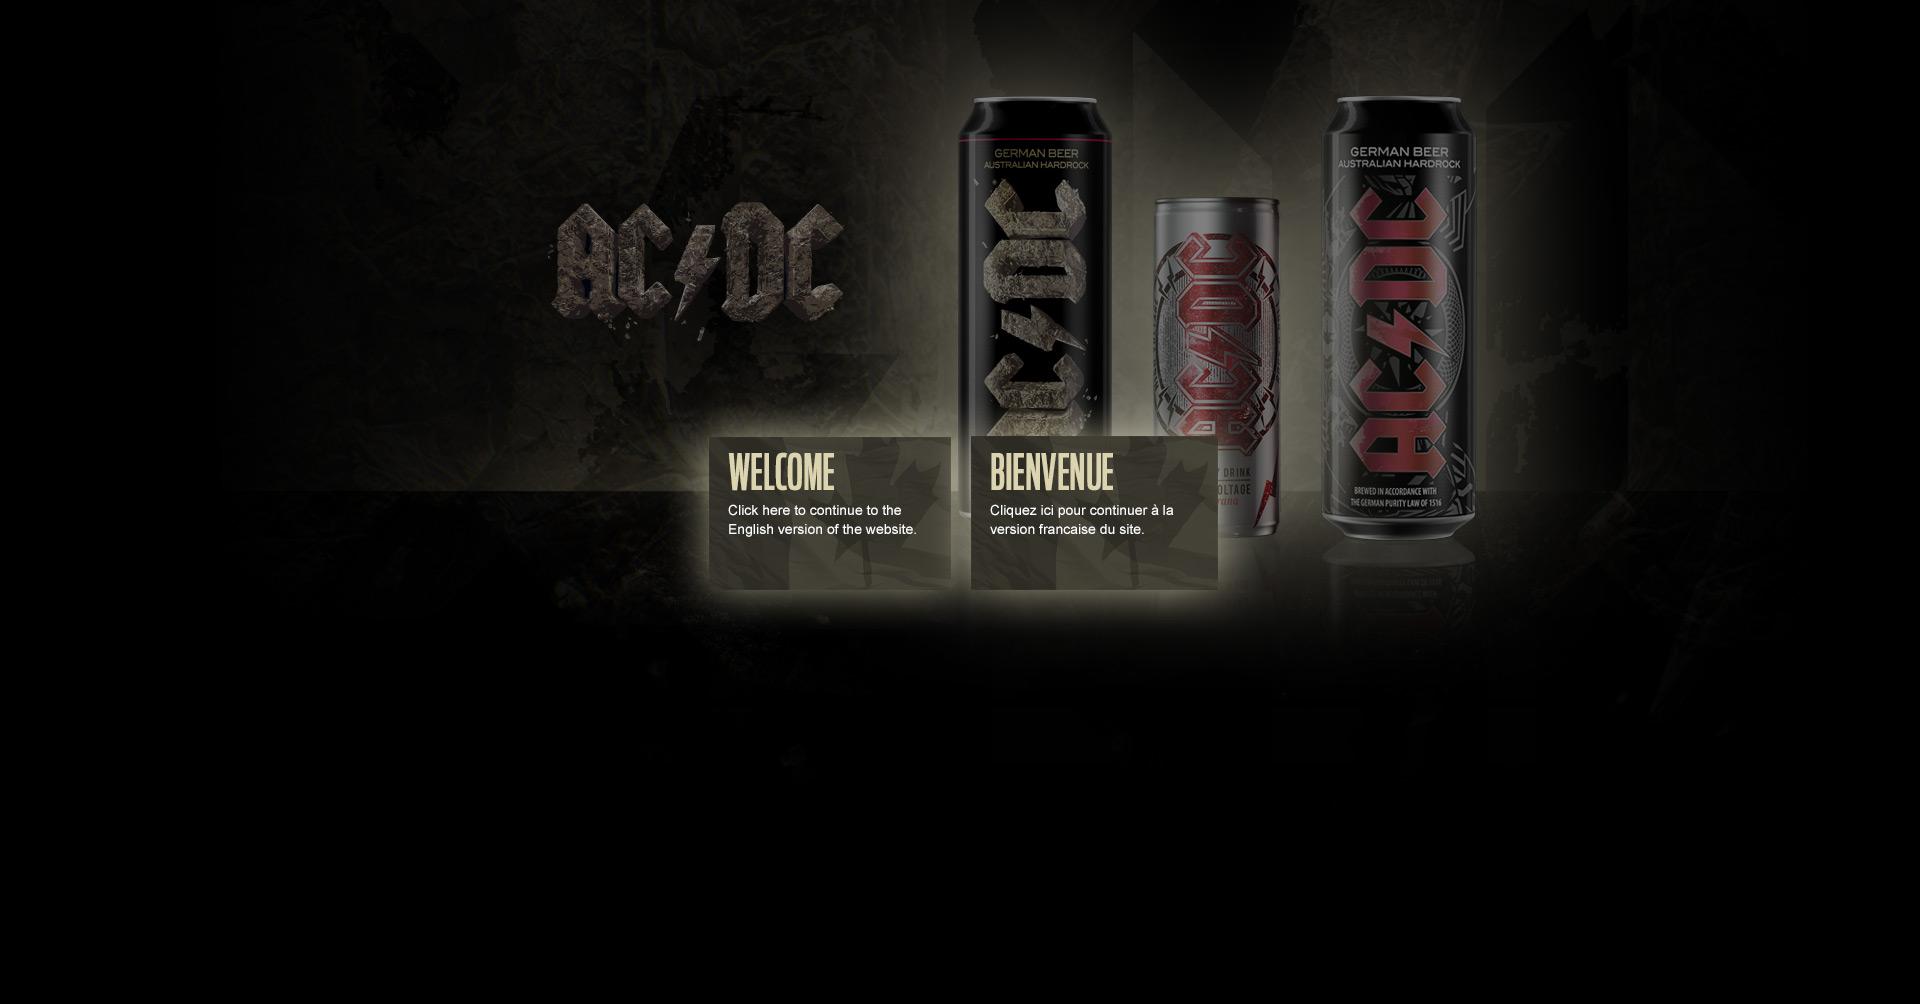 HQ AC DC Beer Wallpapers   File 178.14Kb